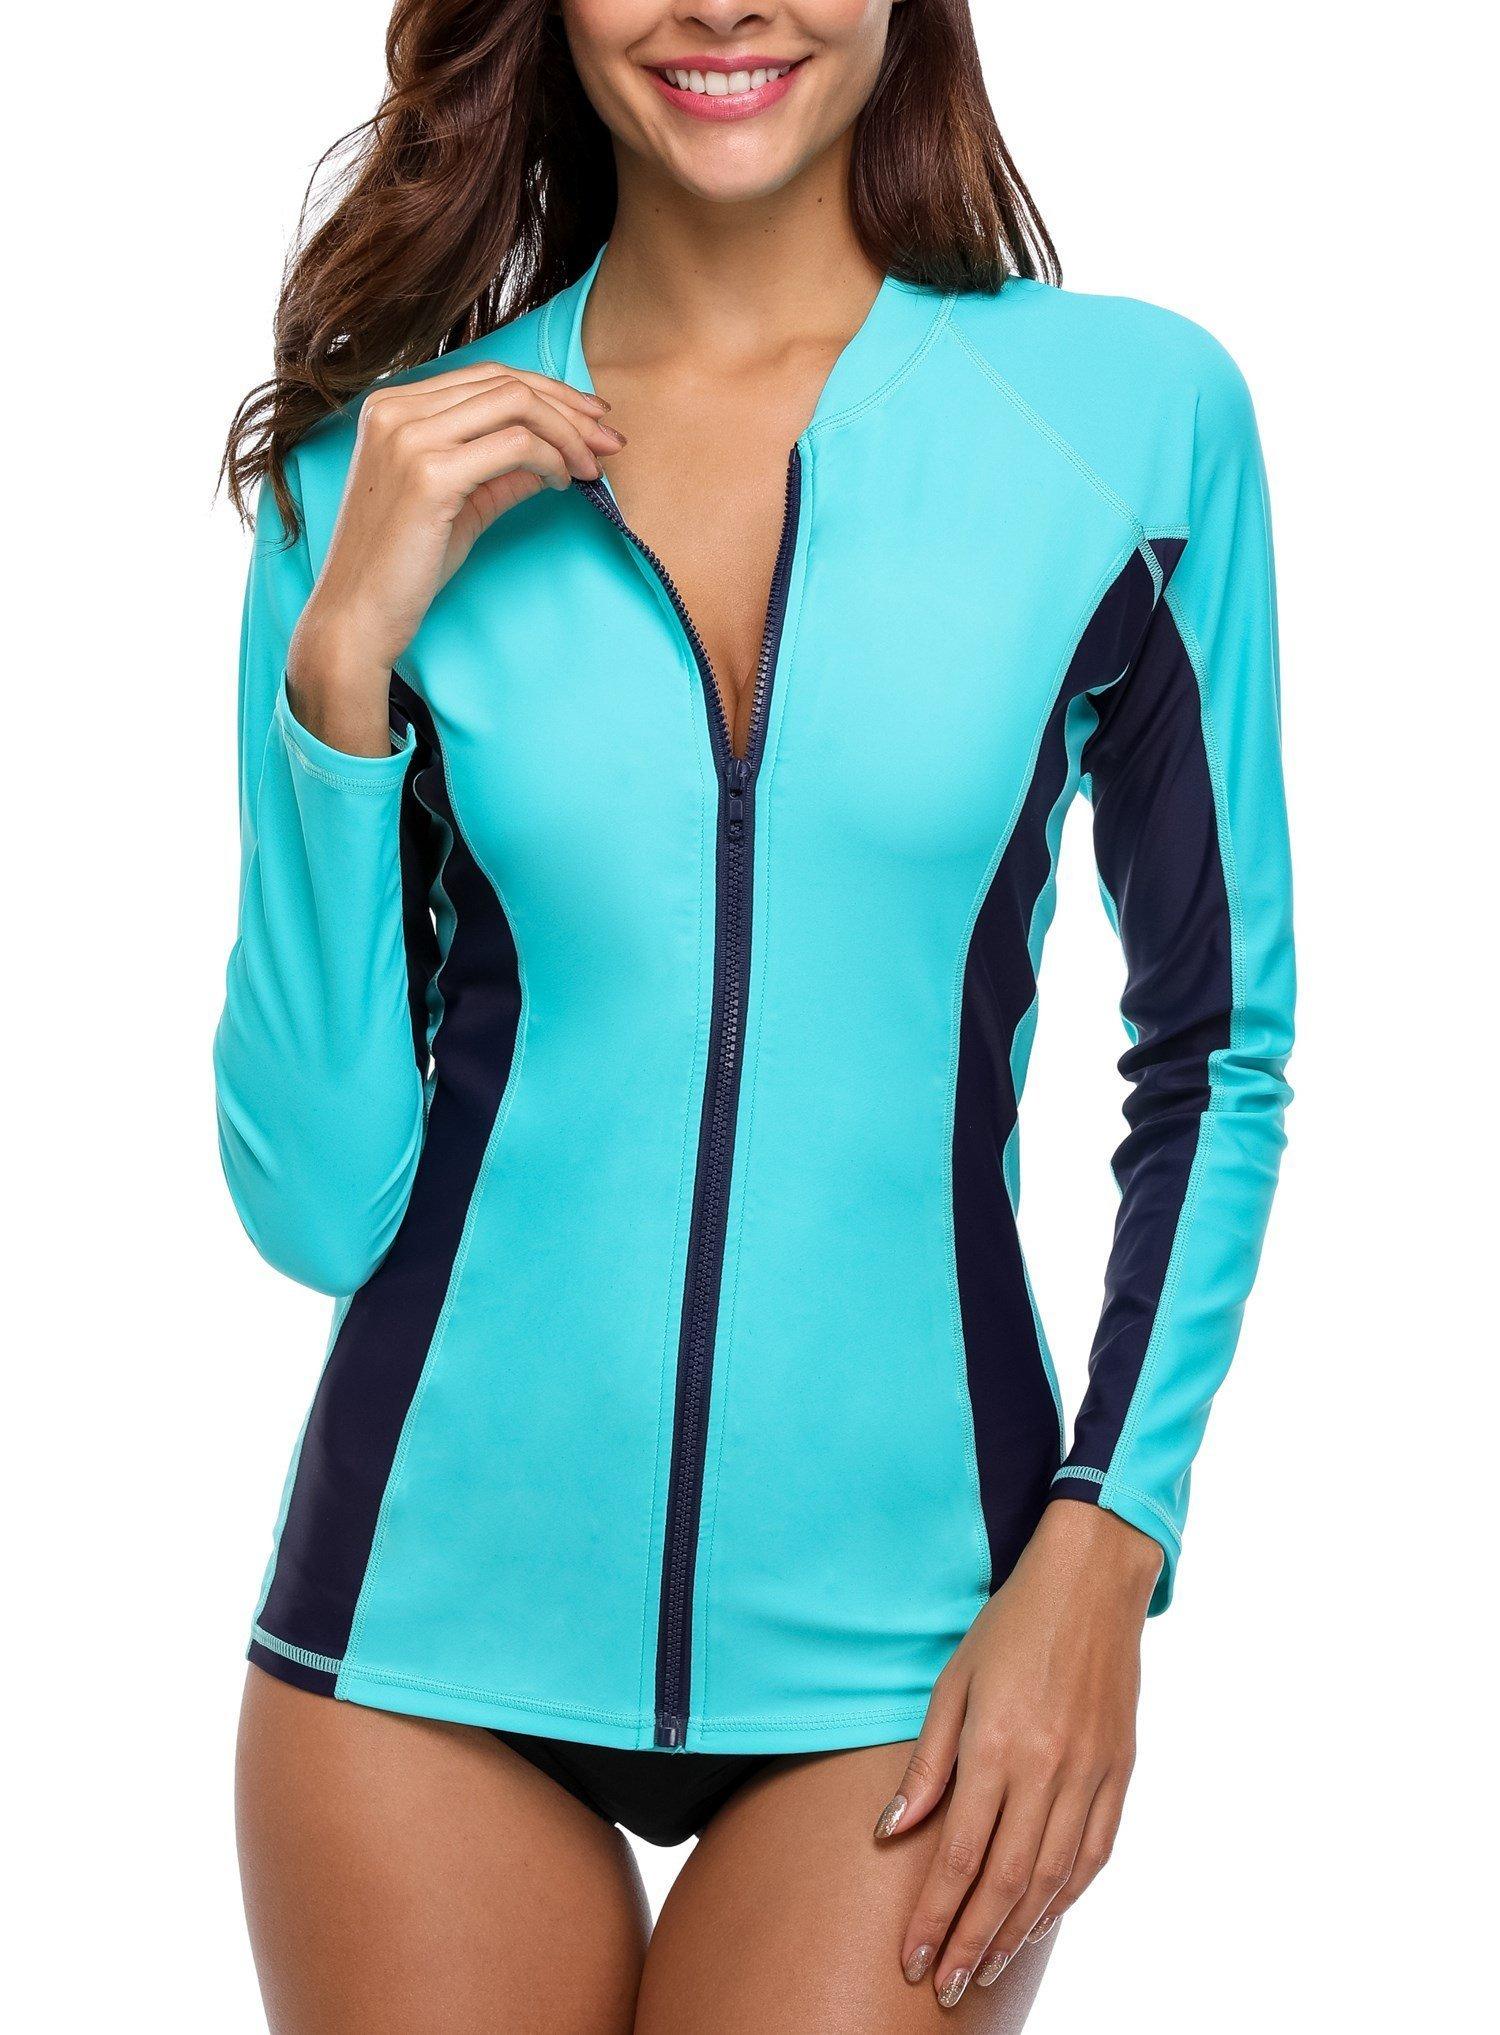 Anwell Zipped Sun Protective Shirt Long Sleeve Swim Tops Aqua XX-Large